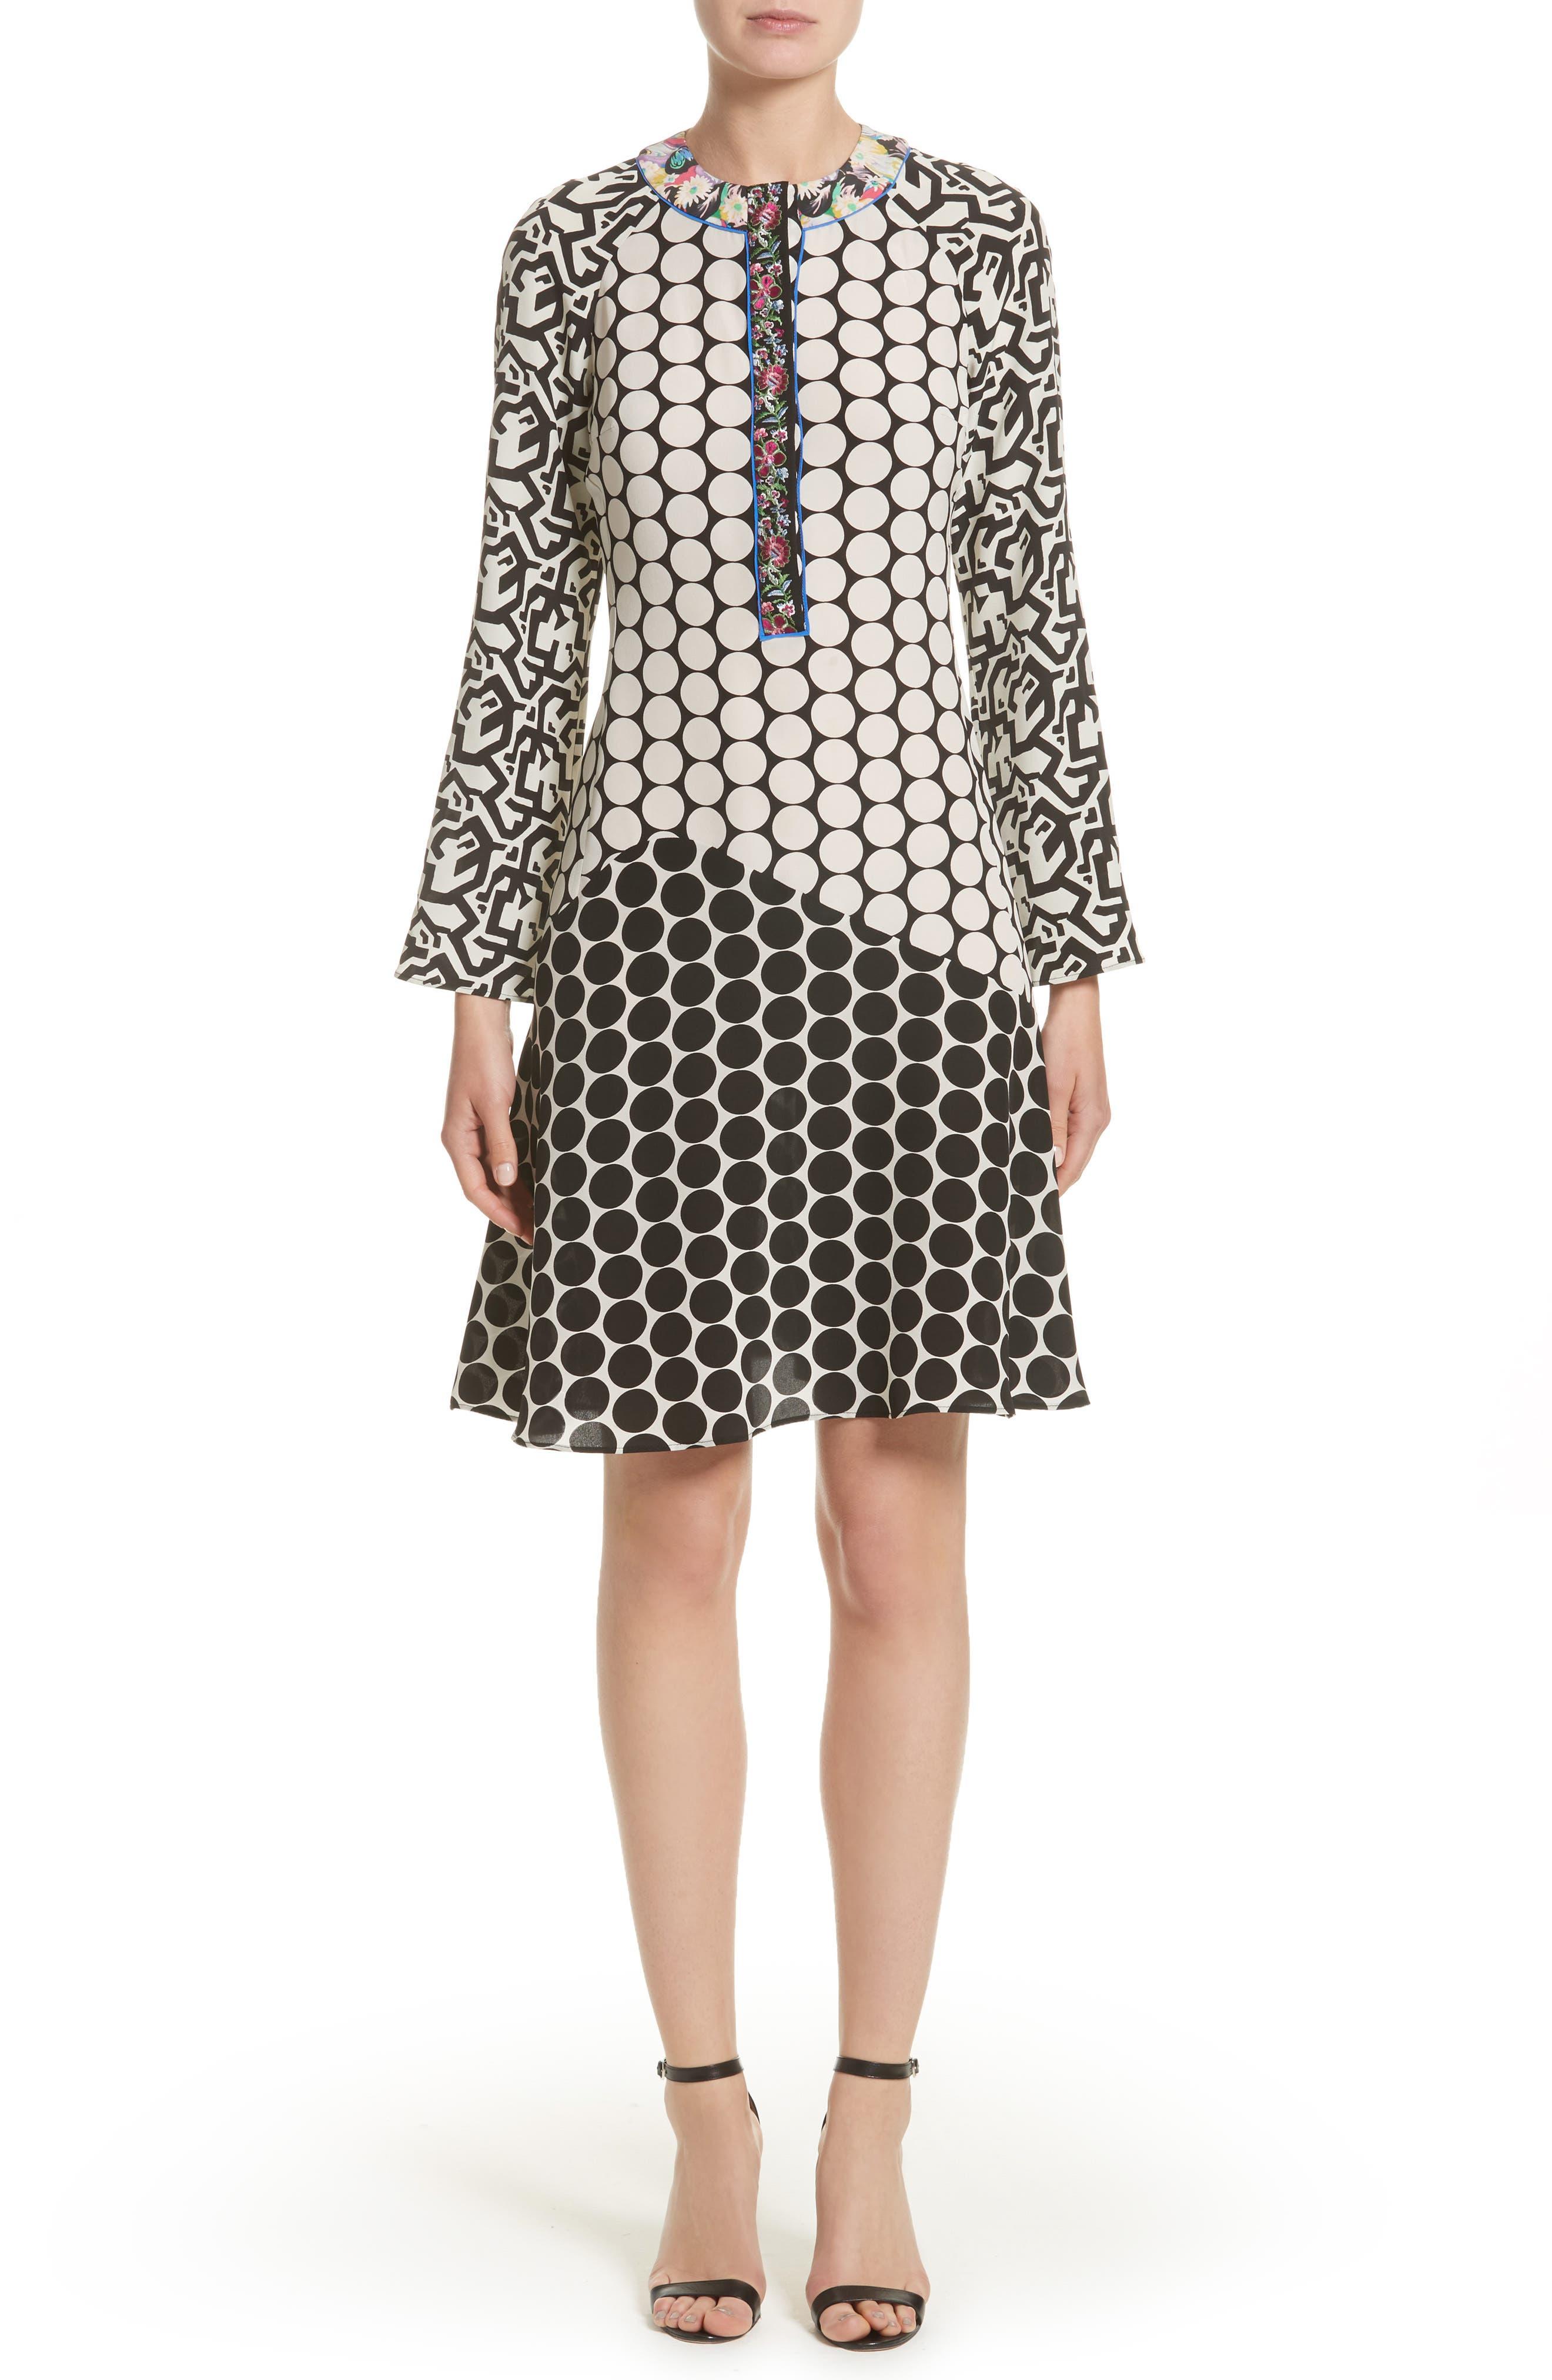 Alternate Image 1 Selected - Etro Polka Dot Print Silk Crêpe de Chine Flutter Dress